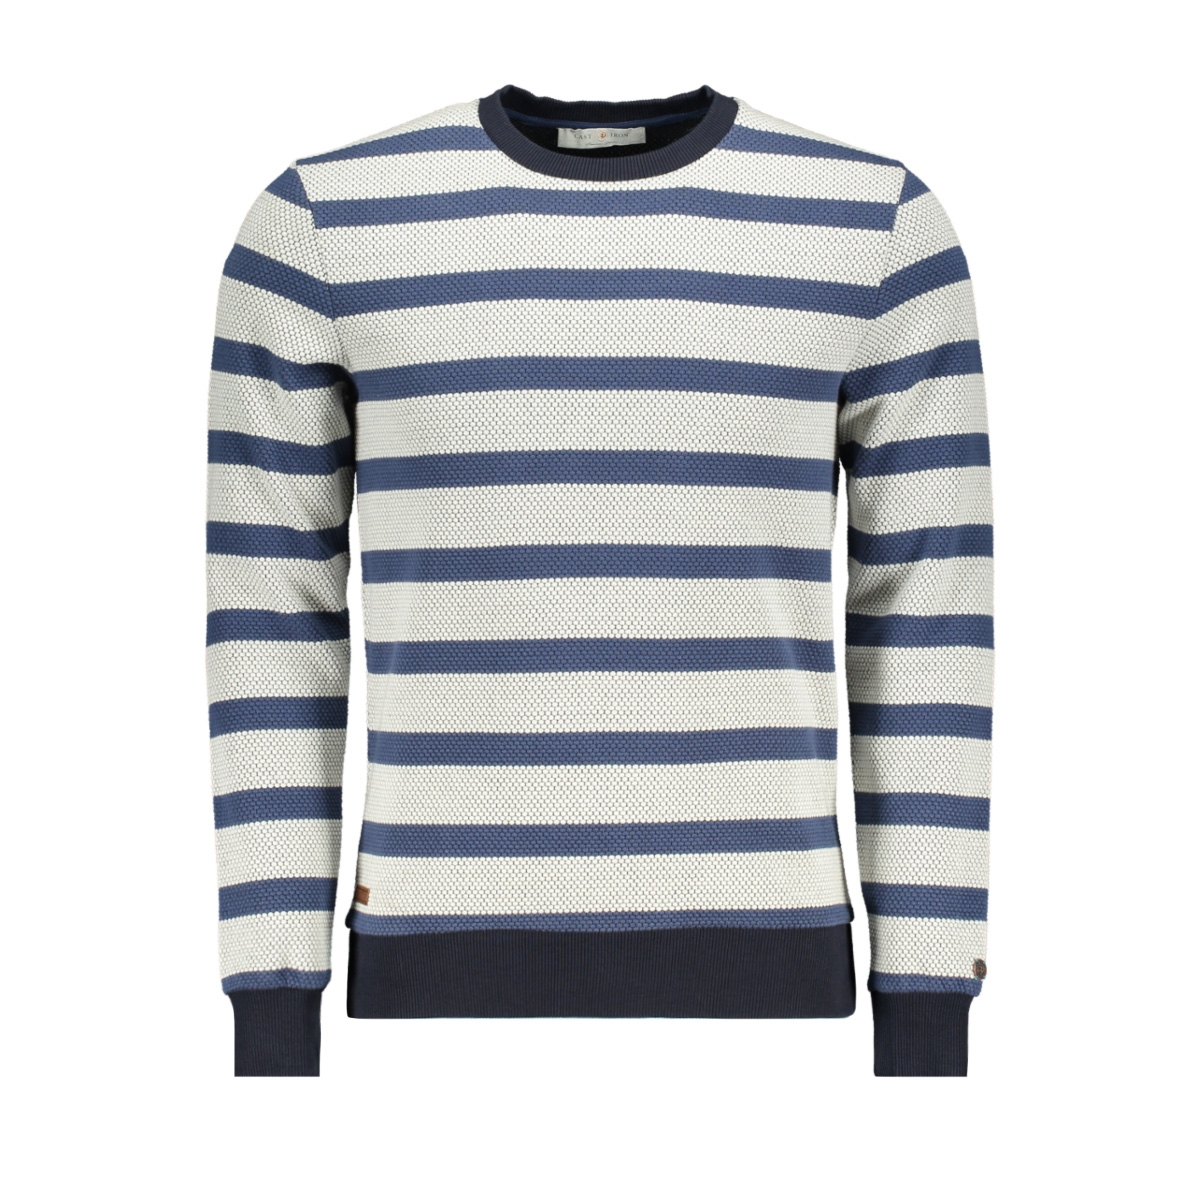 cts188306 cast iron sweater 7014